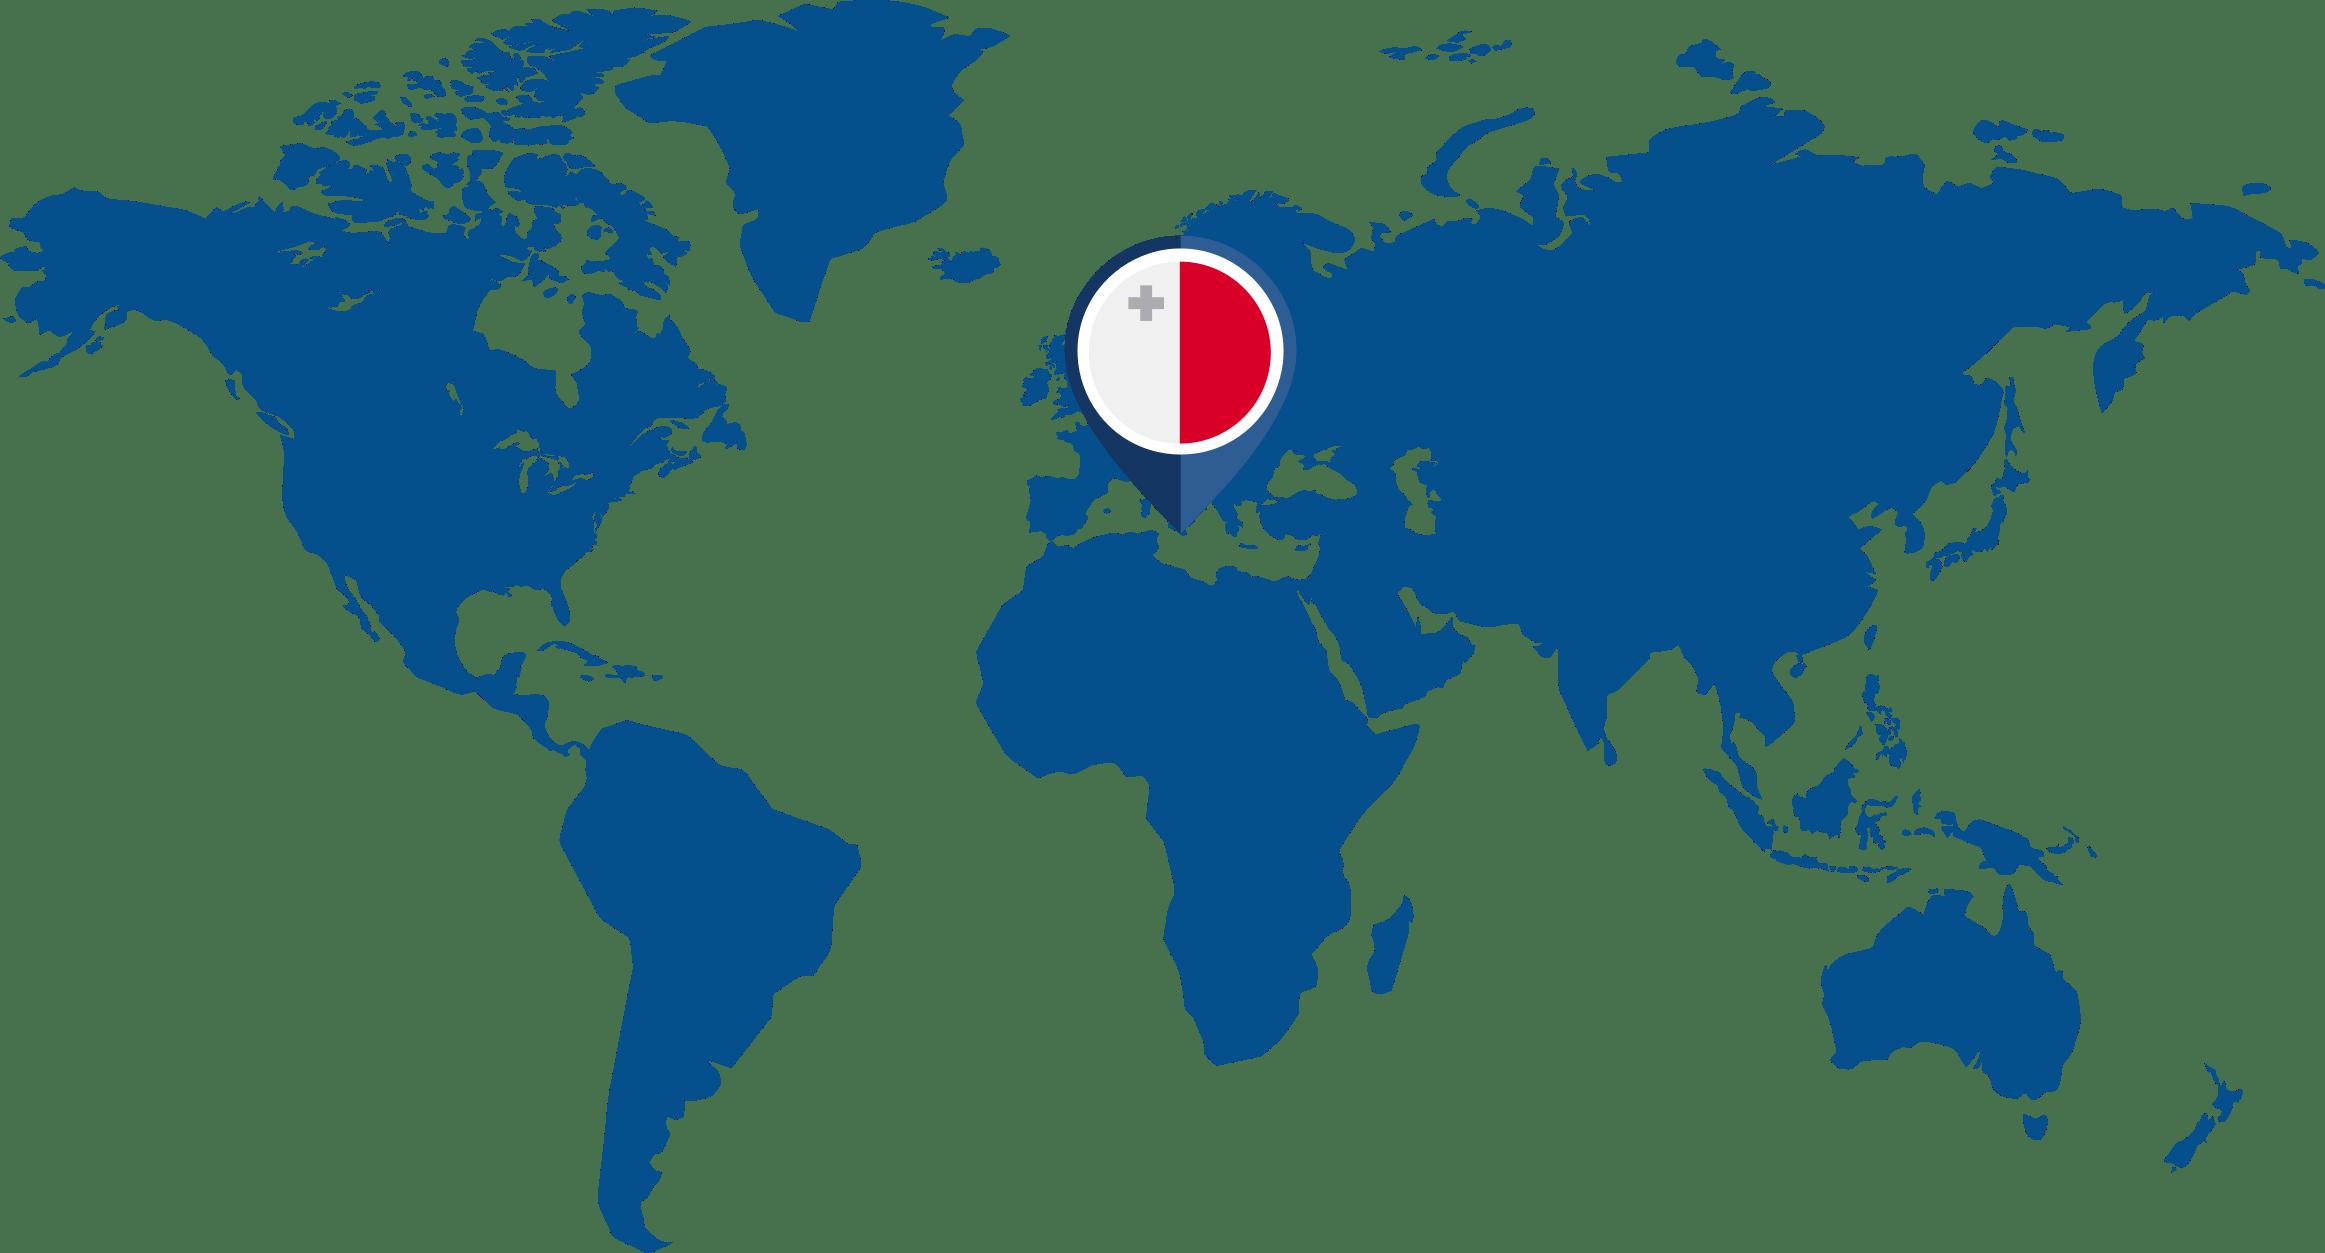 https://bluemina.com/wp-content/uploads/2020/02/Malta-Location-1.png